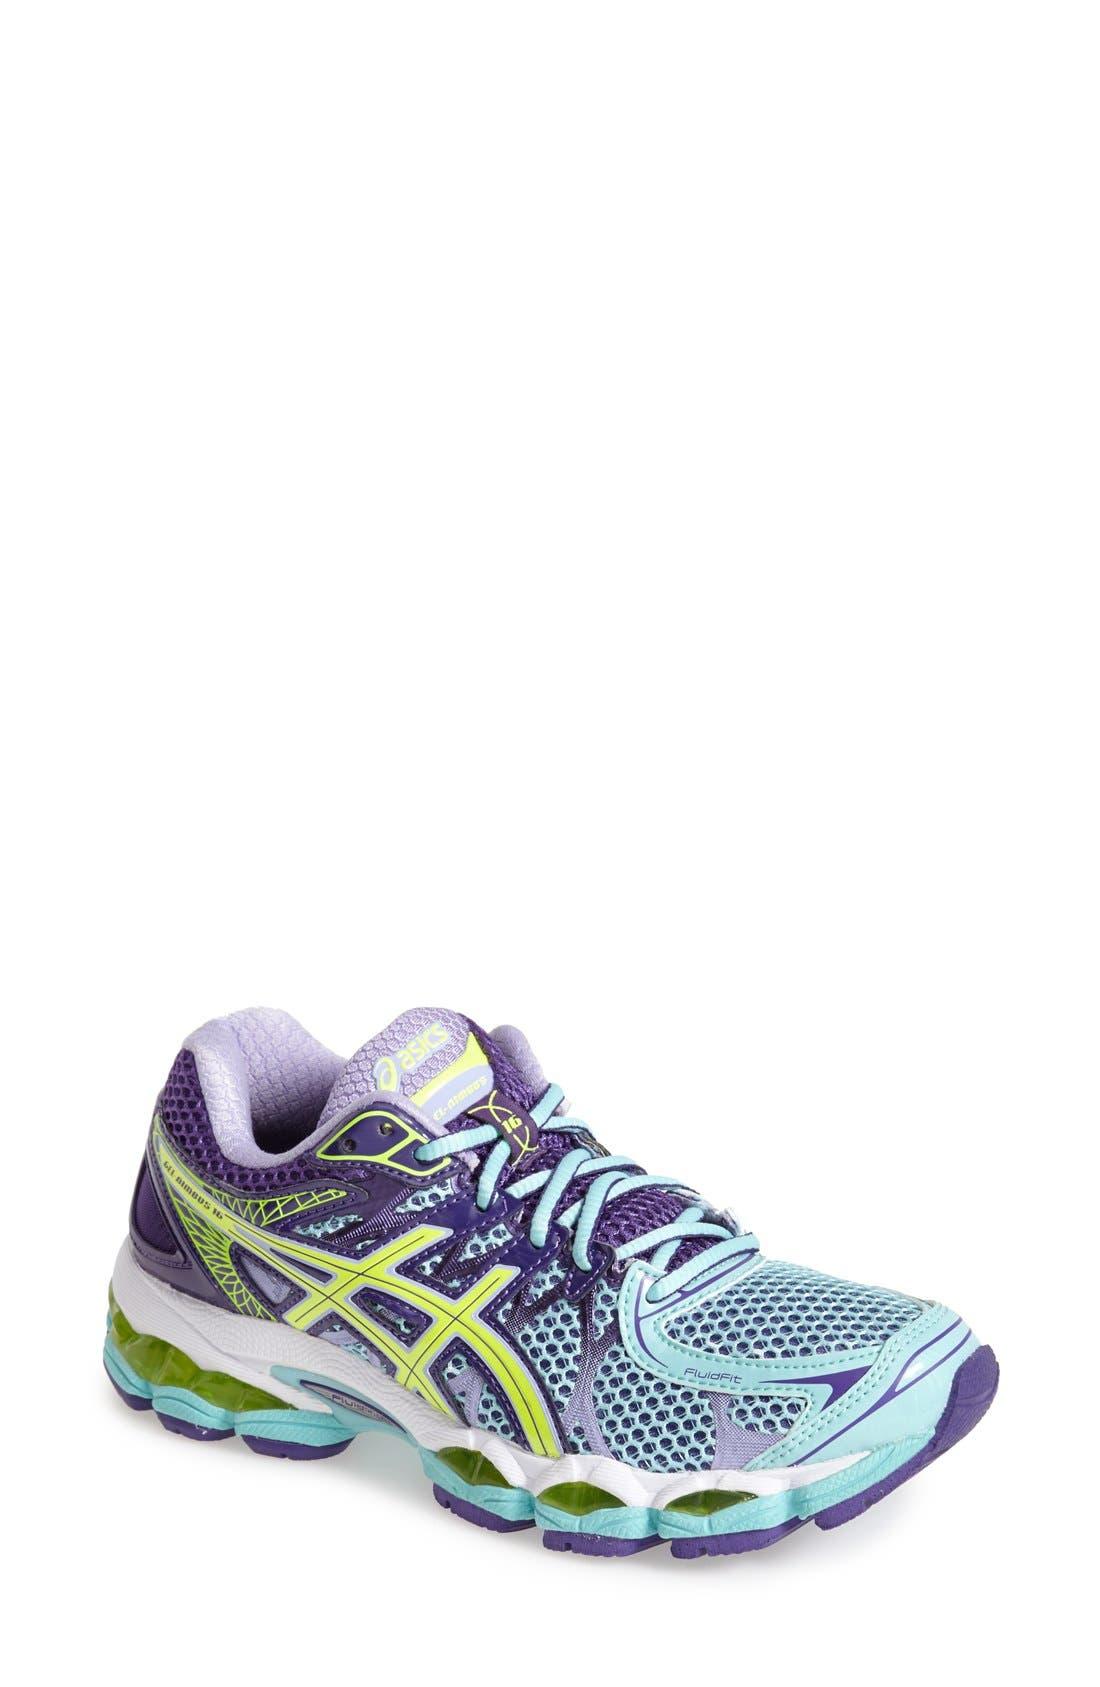 Main Image - ASICS® 'GEL-Nimbus 16' Running Shoe (Women)